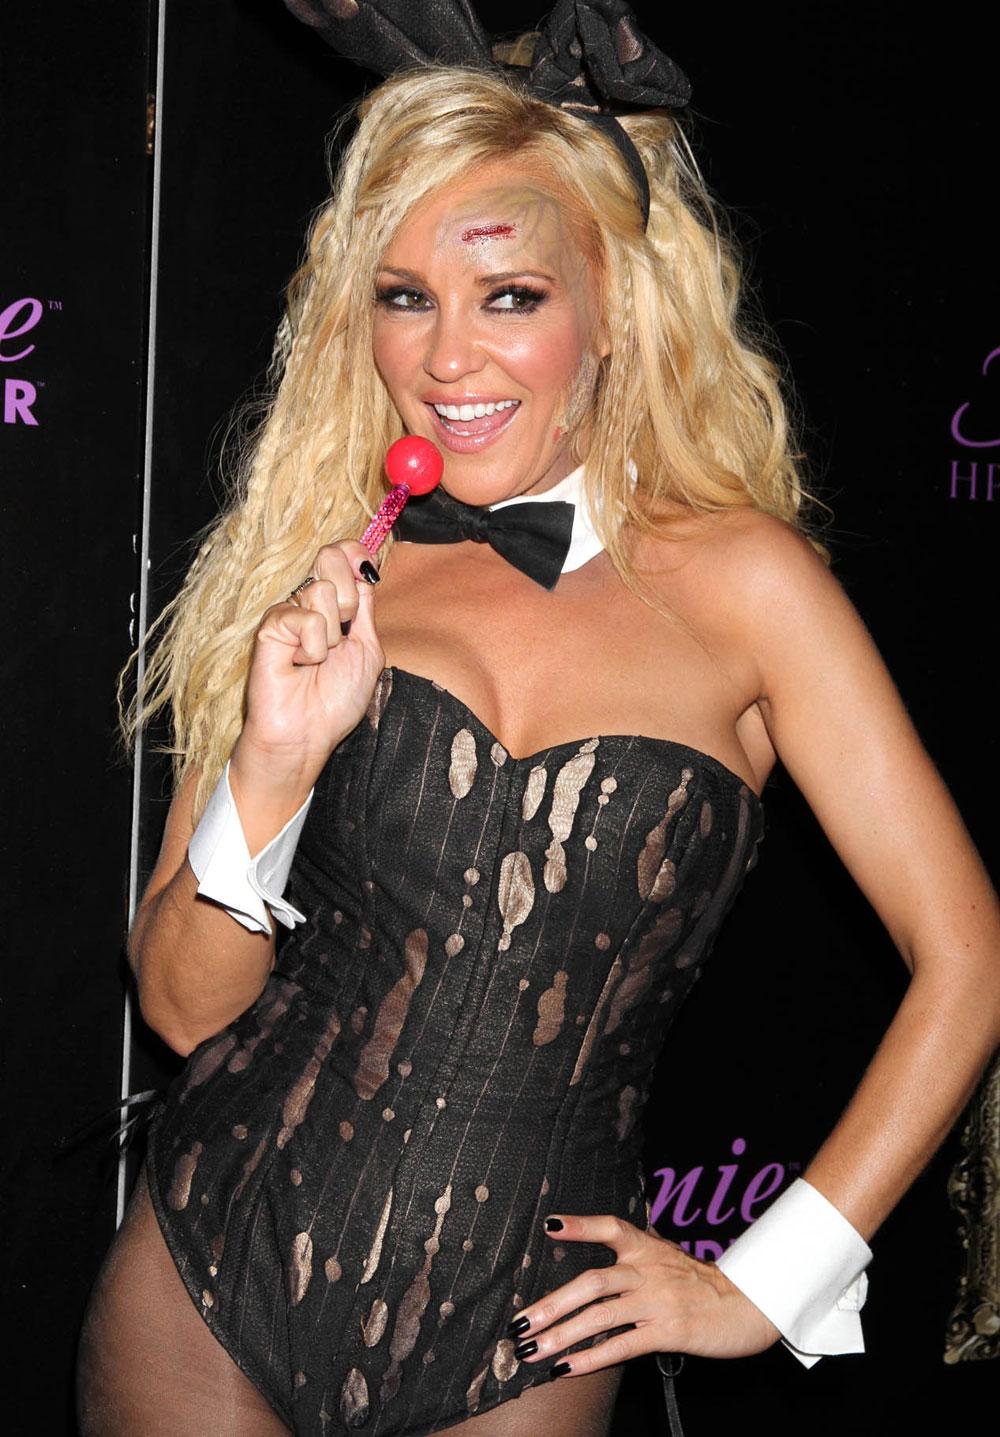 Bridget Marquardt at Halloween Party in Gallery Nightclub in Las ...